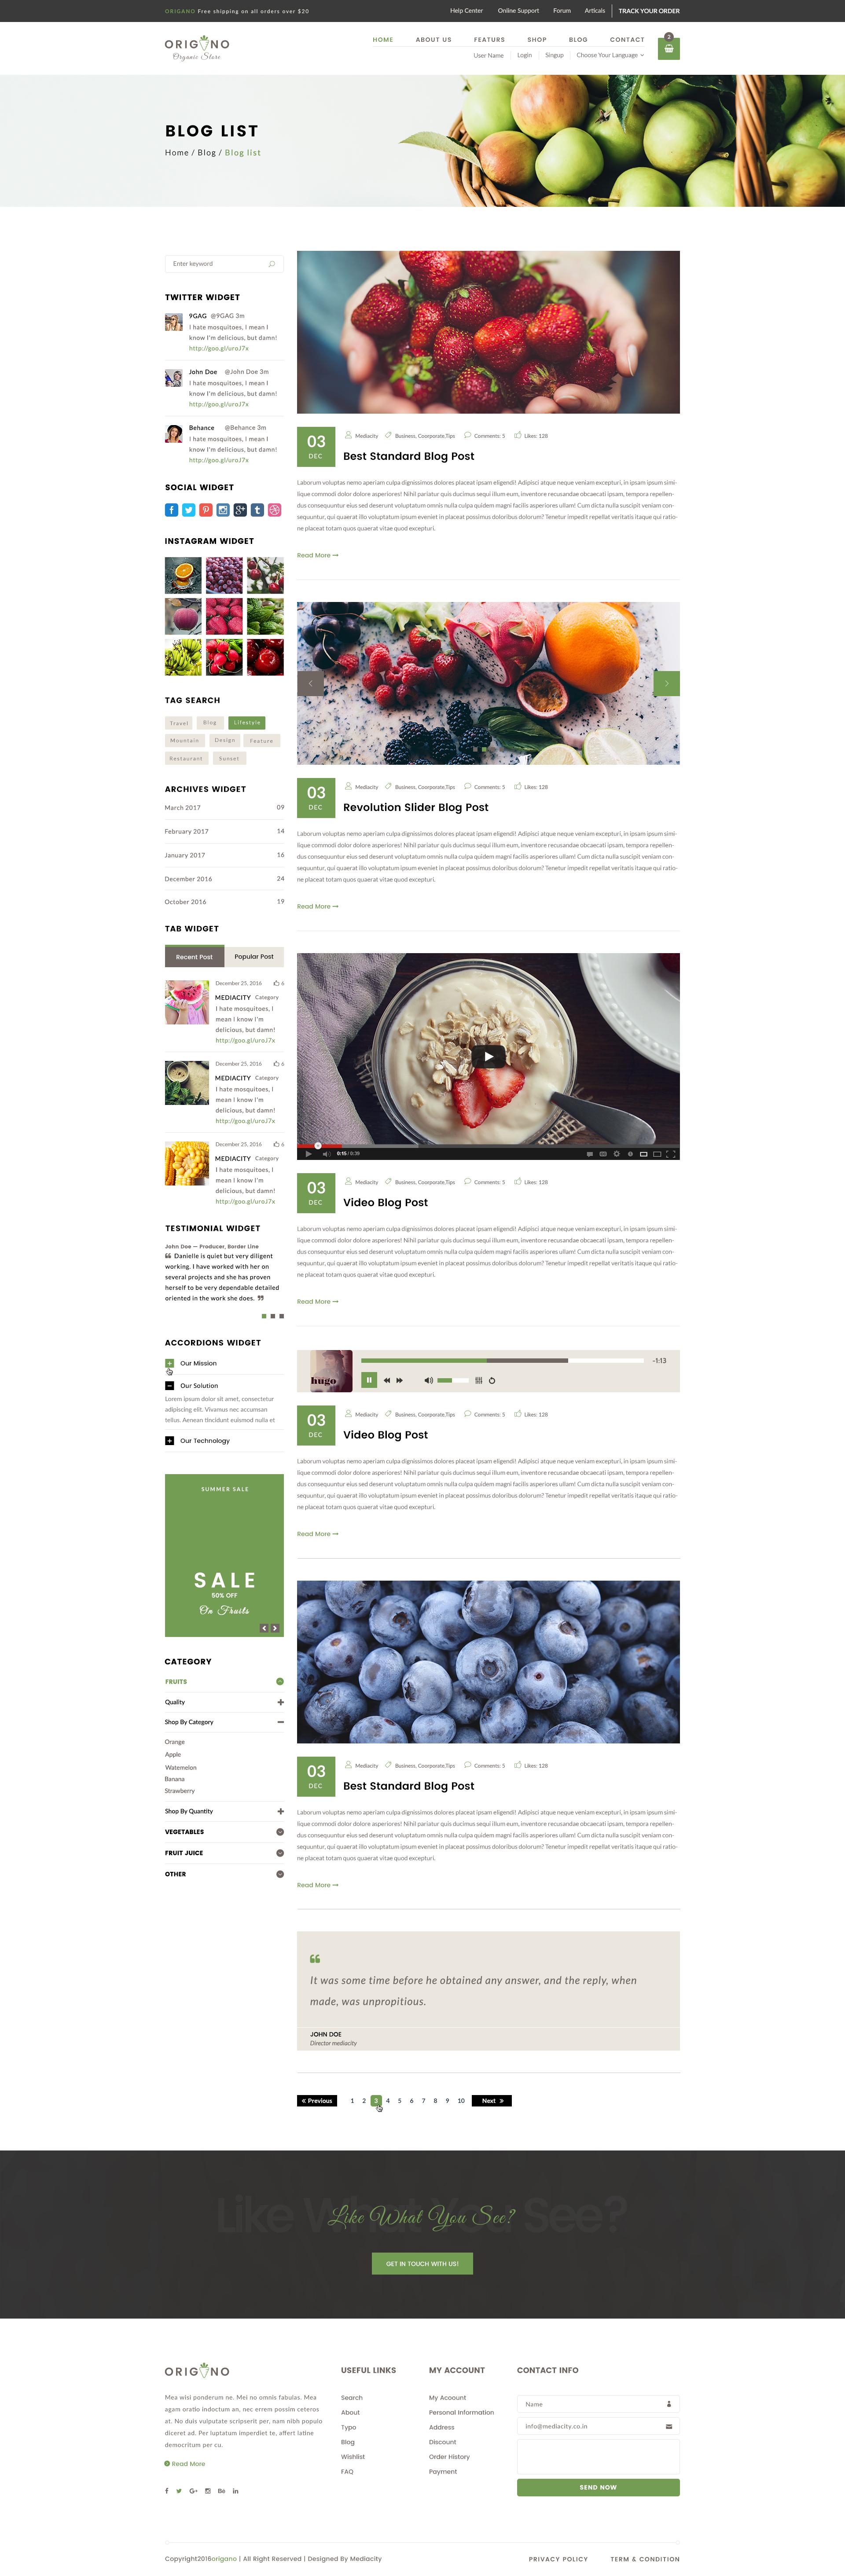 Origano - Organic Store HTML Template by media-city   ThemeForest